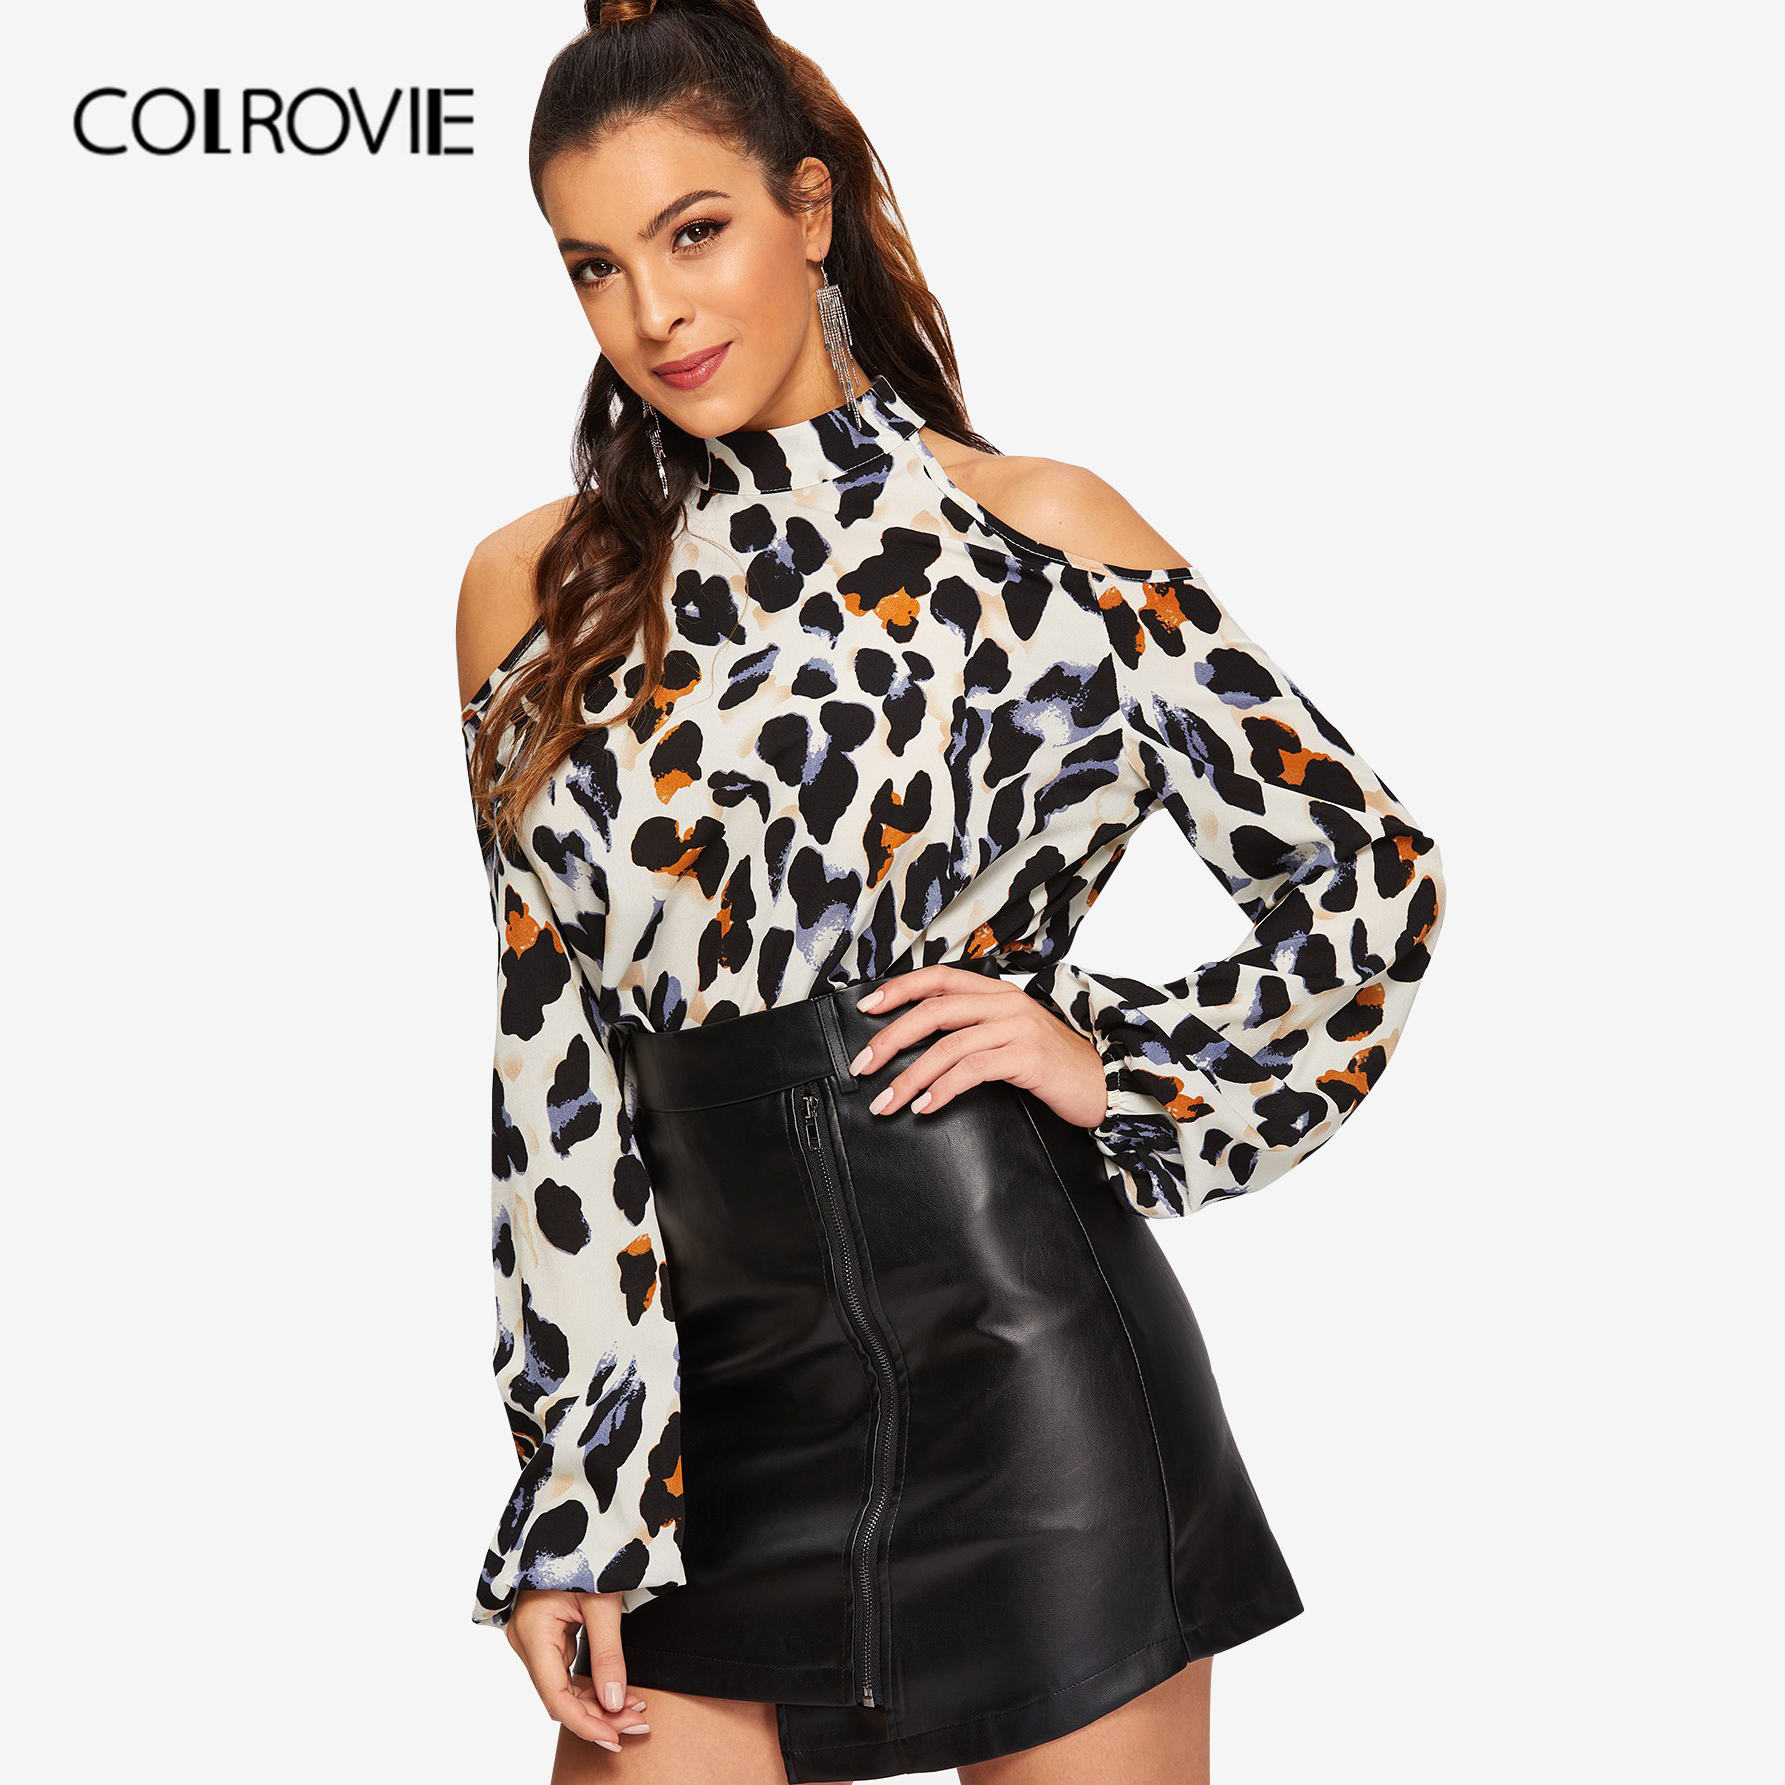 COLROVIE Cold Shoulder Leopard Print Blouse Women Shirts 2019 Spring Korean Fashion Long Sleeve Shirt Elegant Office Ladies Tops blusa sexi animal print